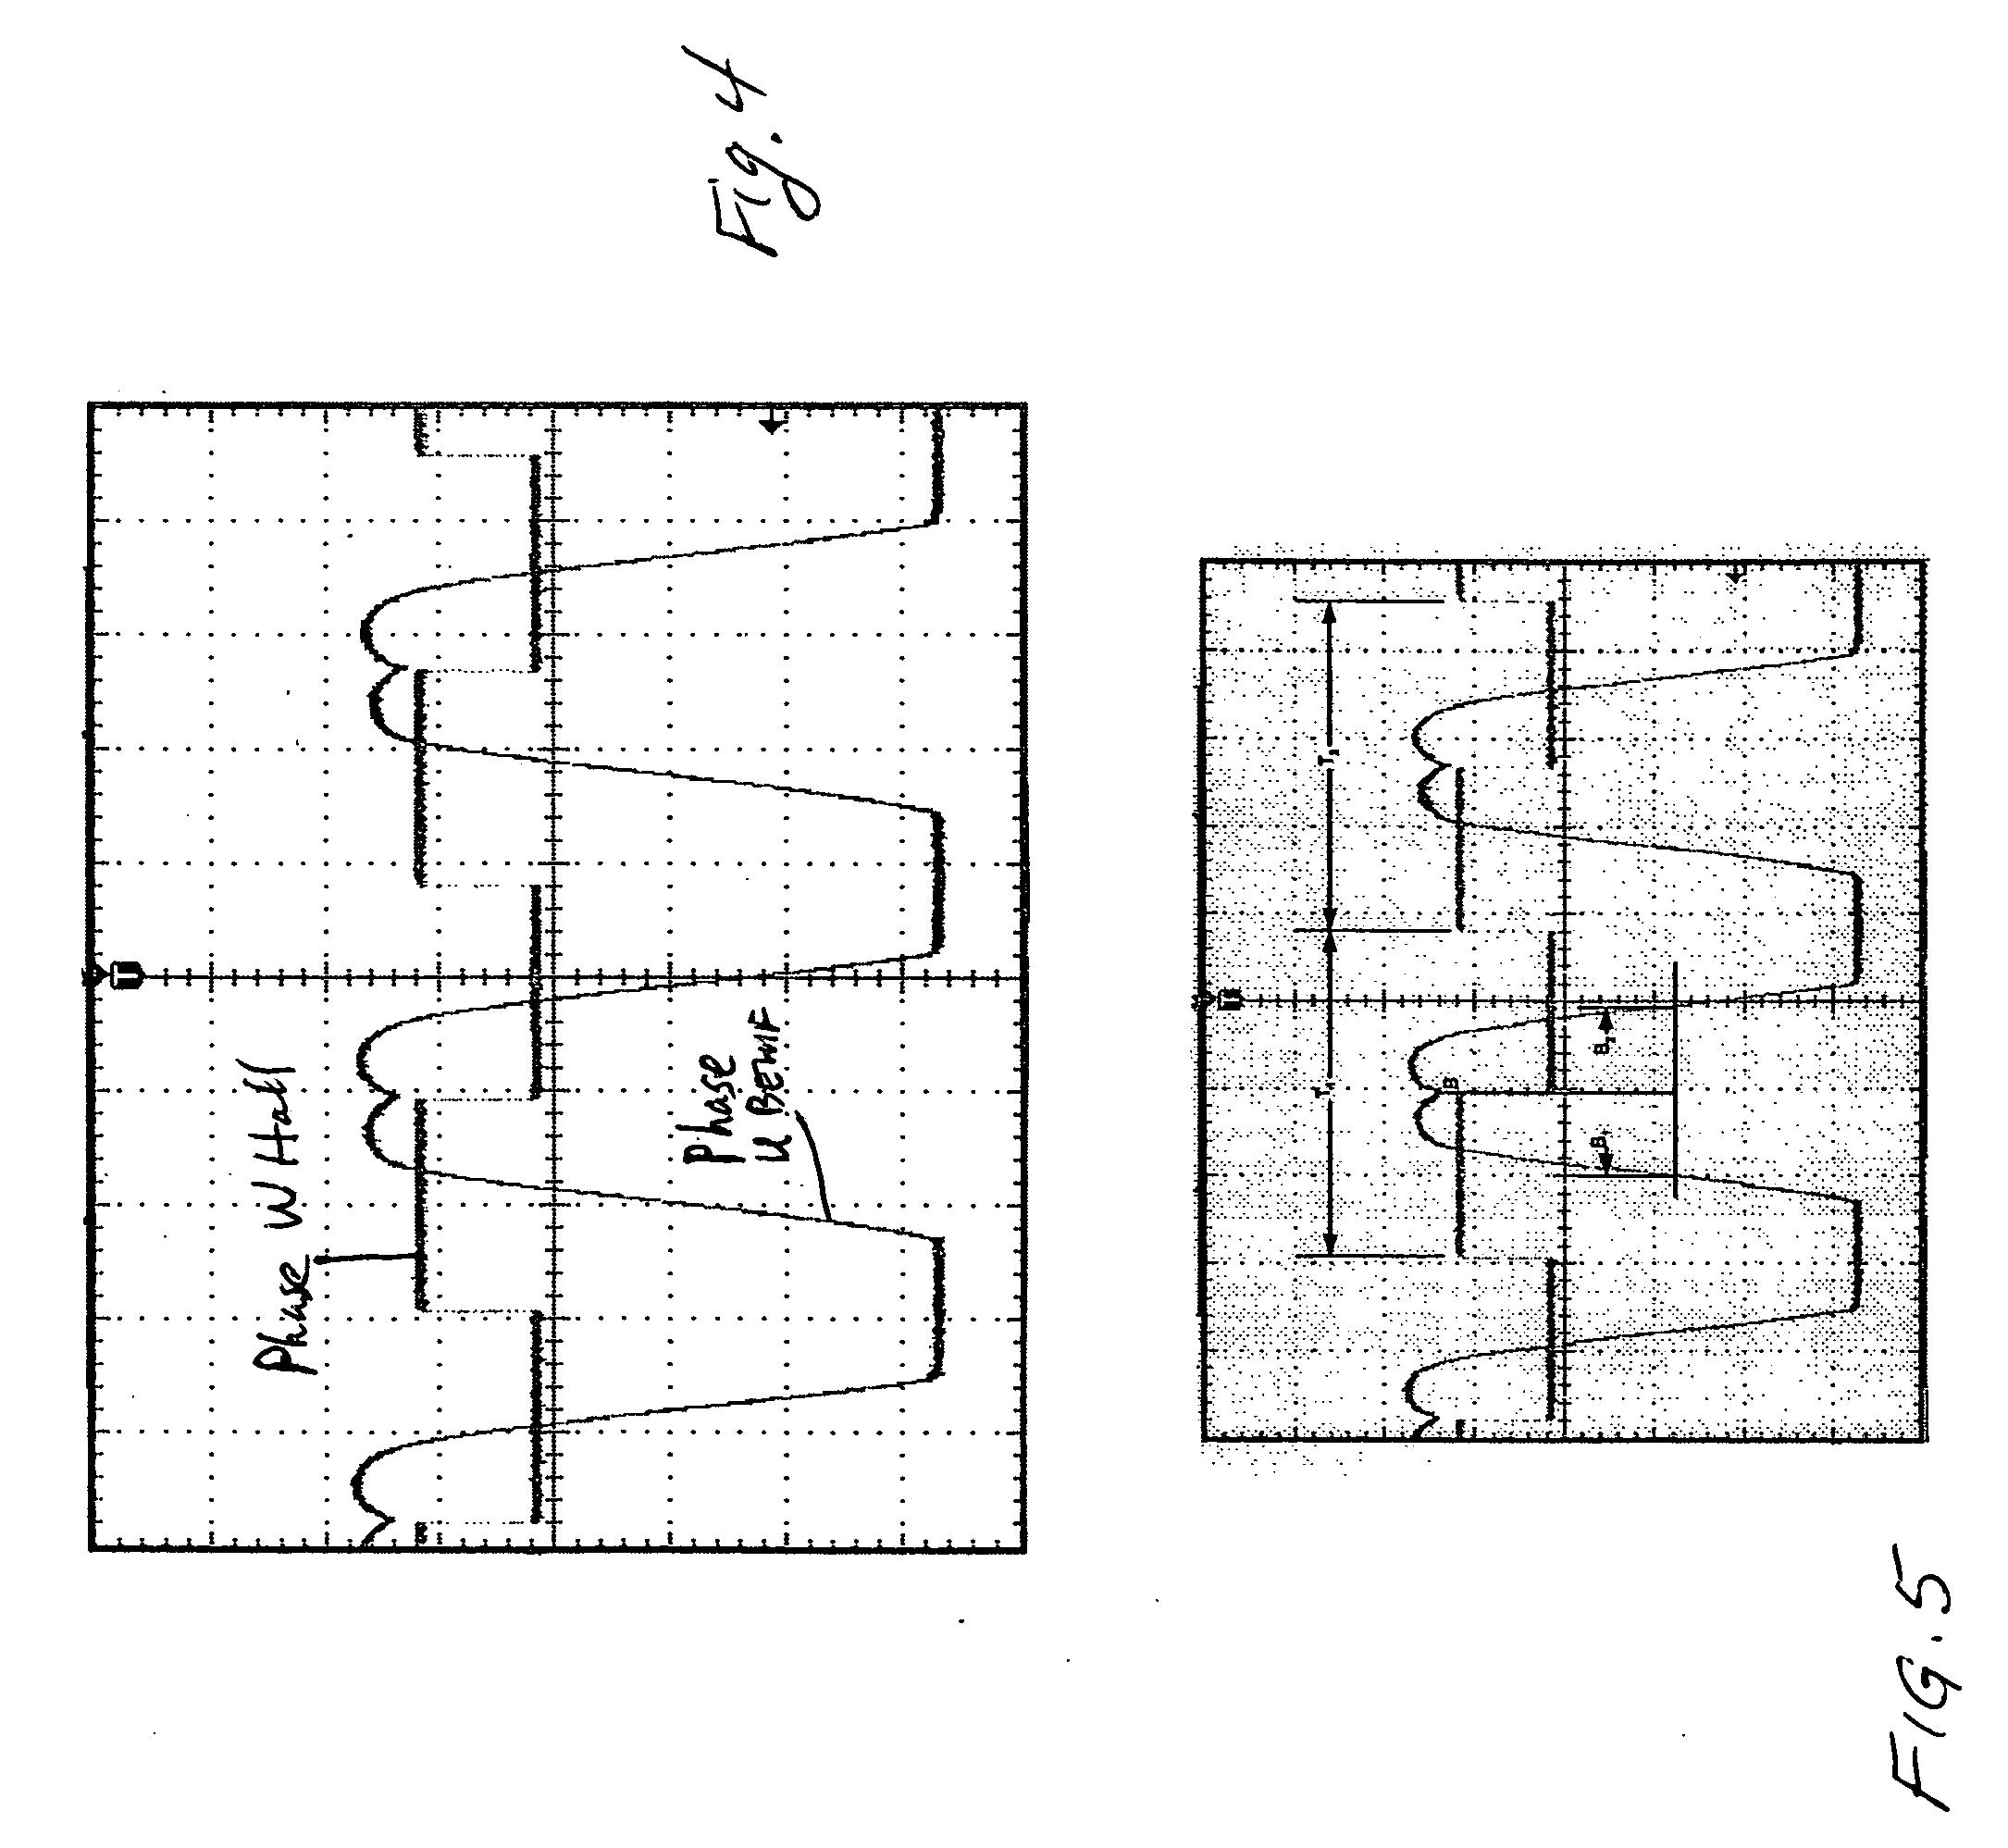 Patent Us20050275361 Hall Sensor Alignment For Bldc